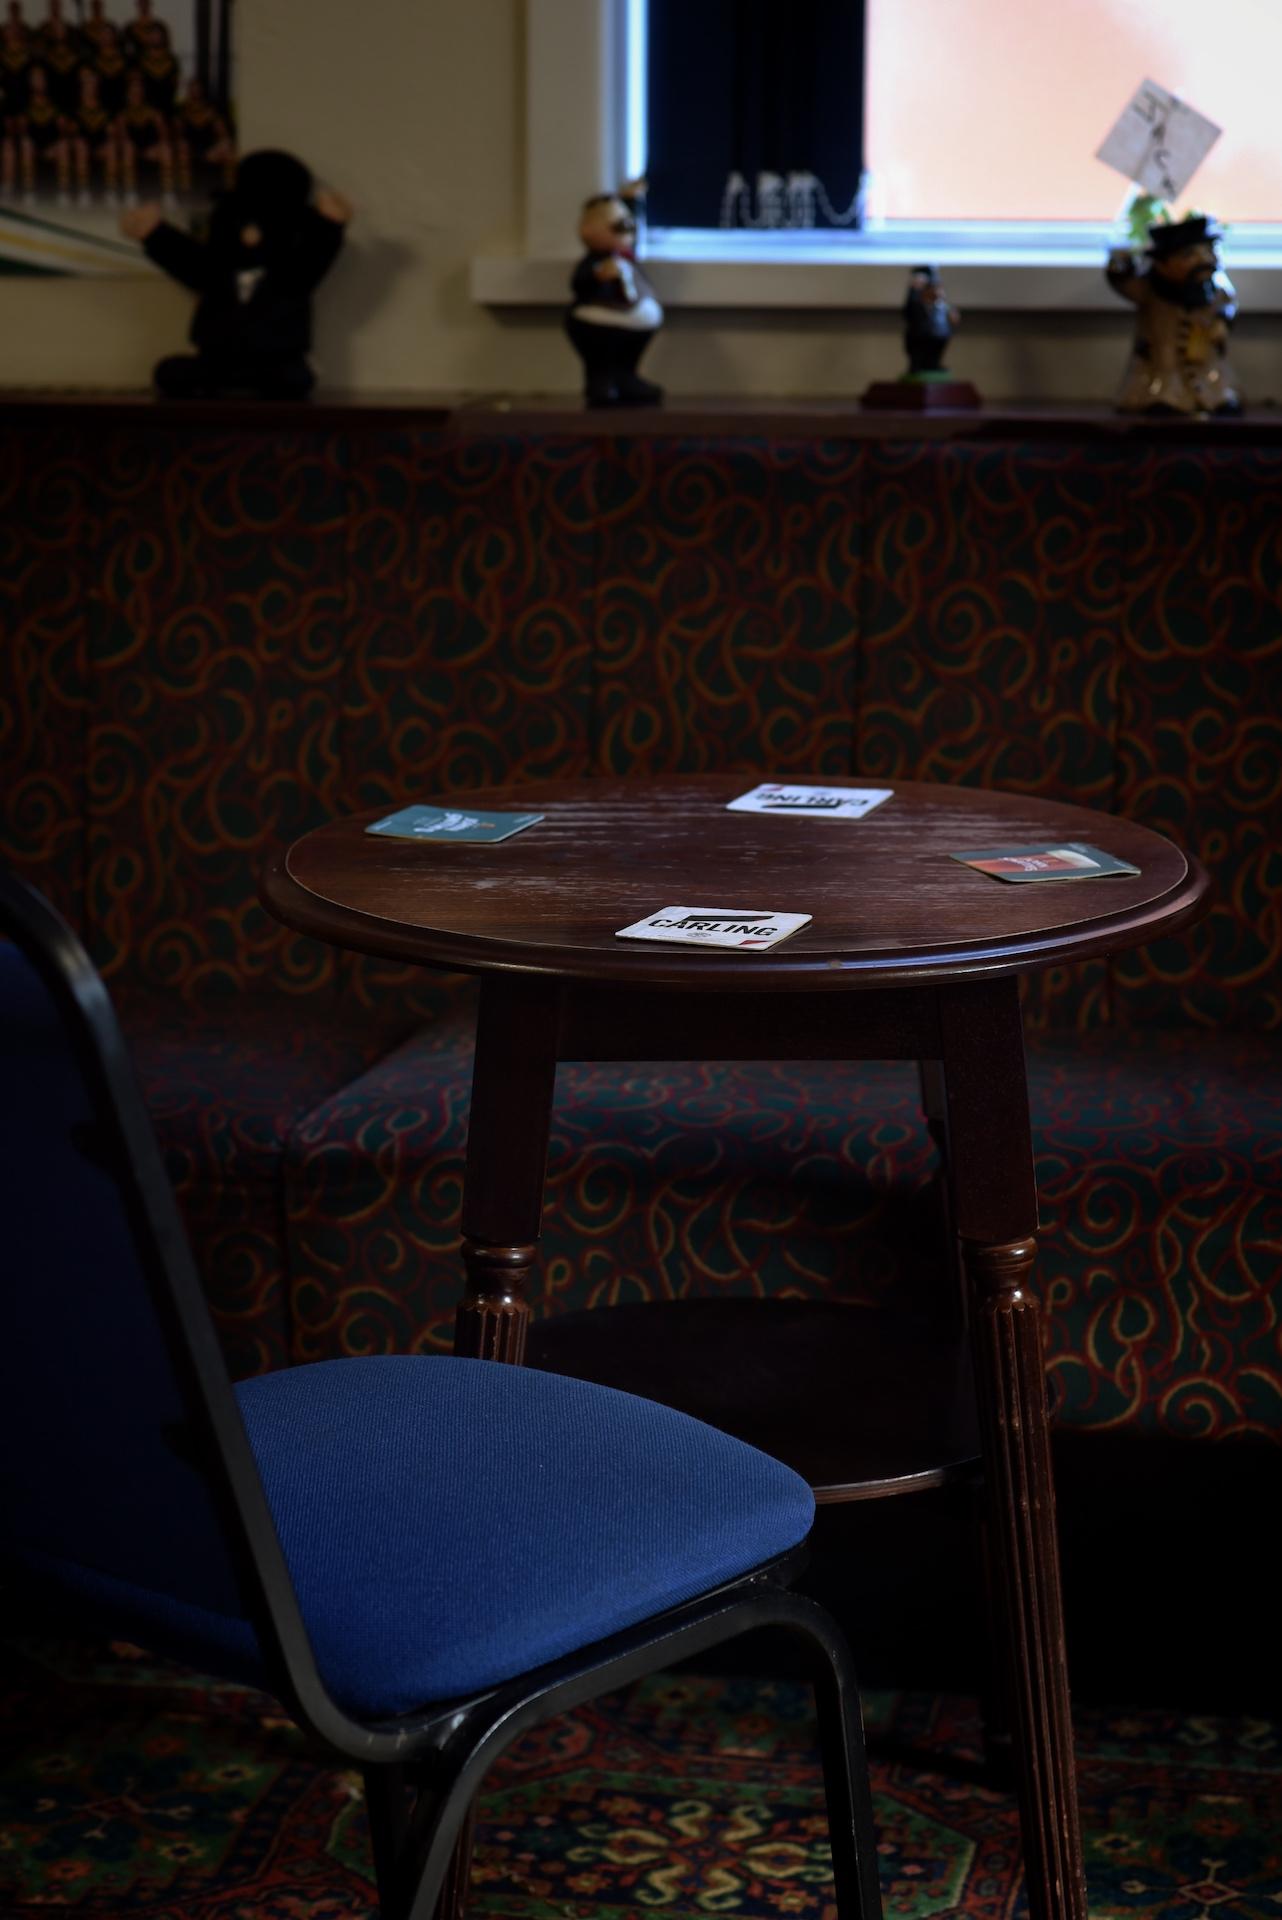 Unreserved Seat - 02 - Paul Grech - smaller 01.jpg